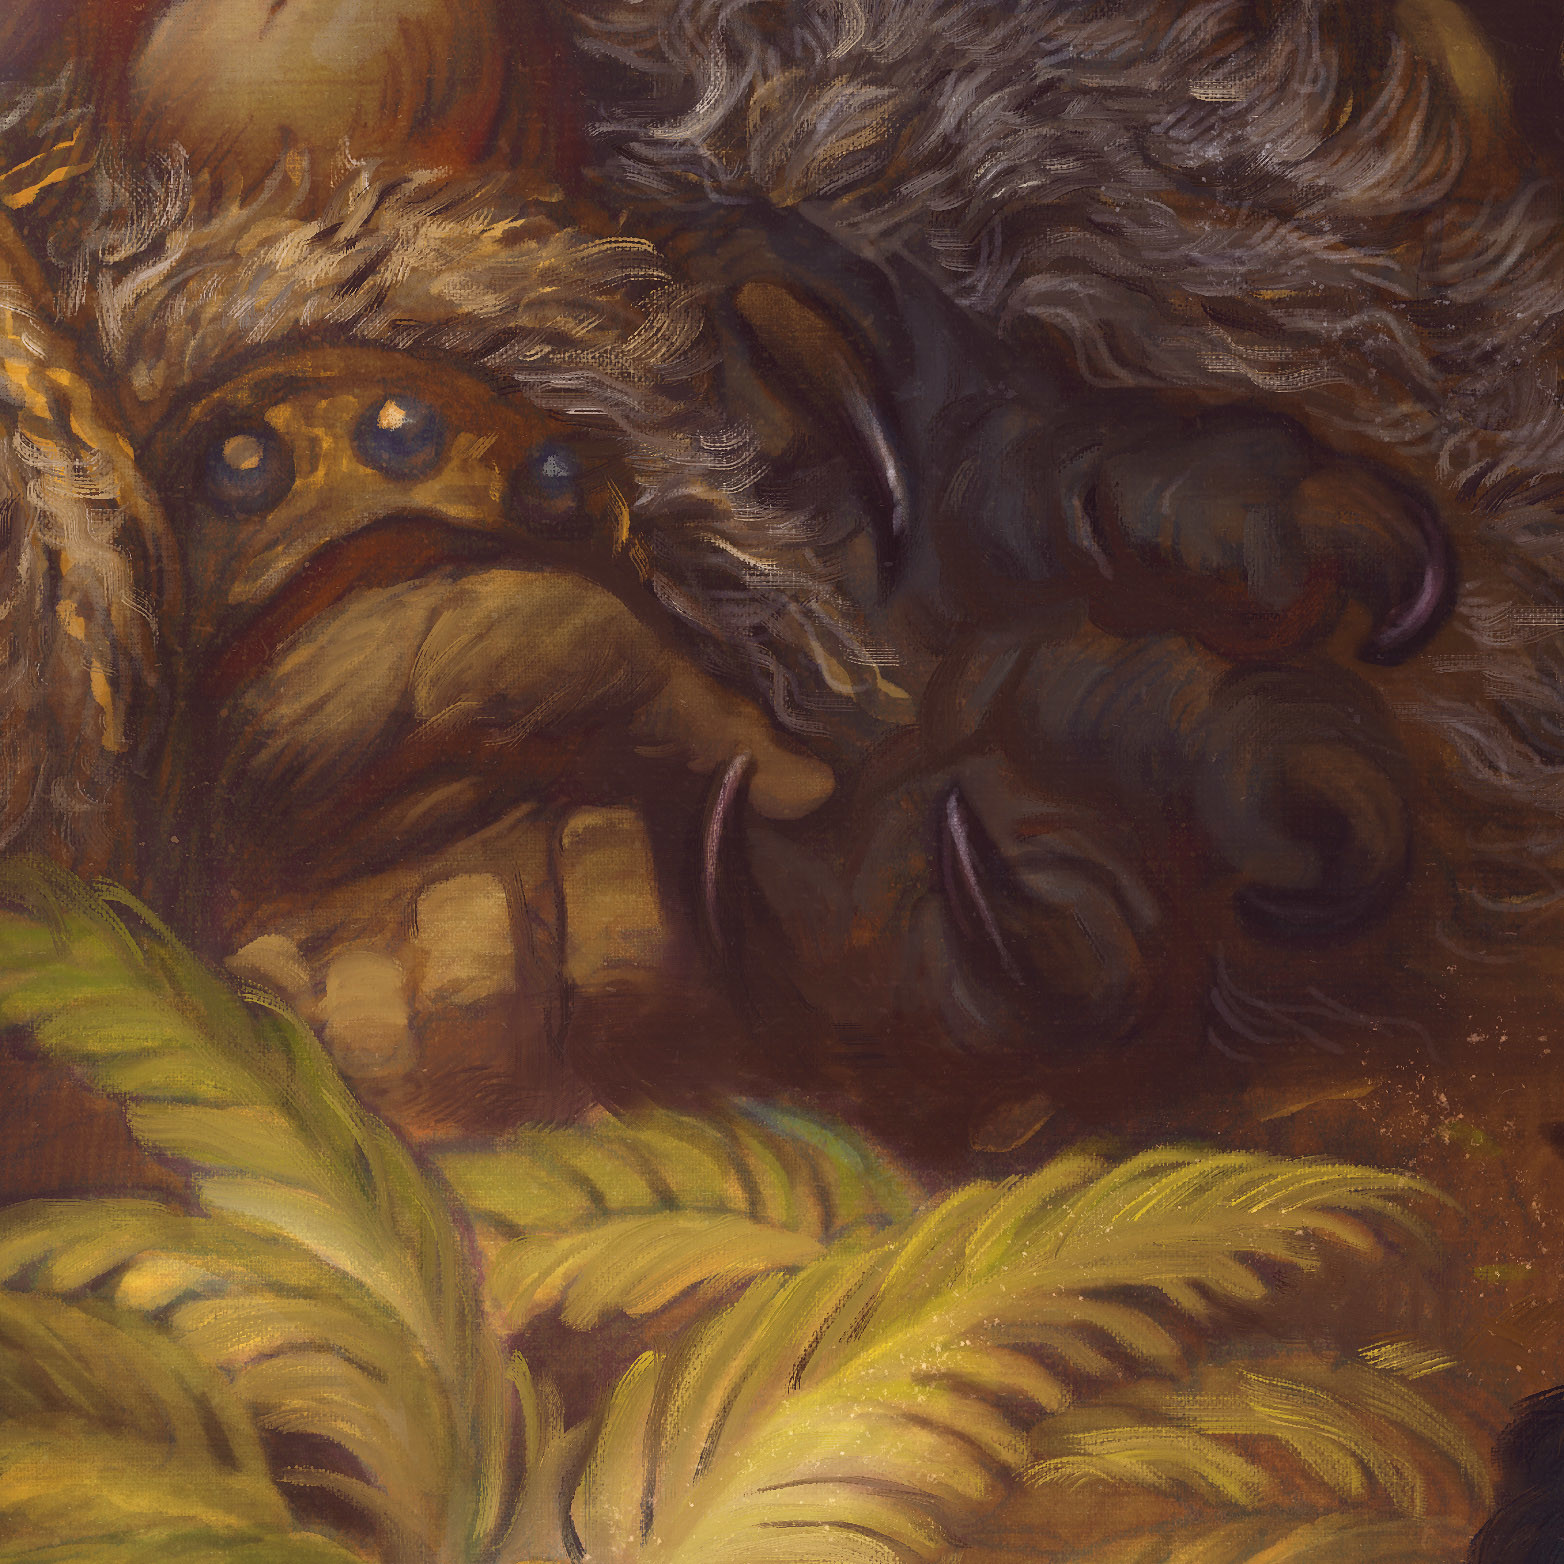 Detail of Beren's cloak, the wolf-hame of Draugluin.